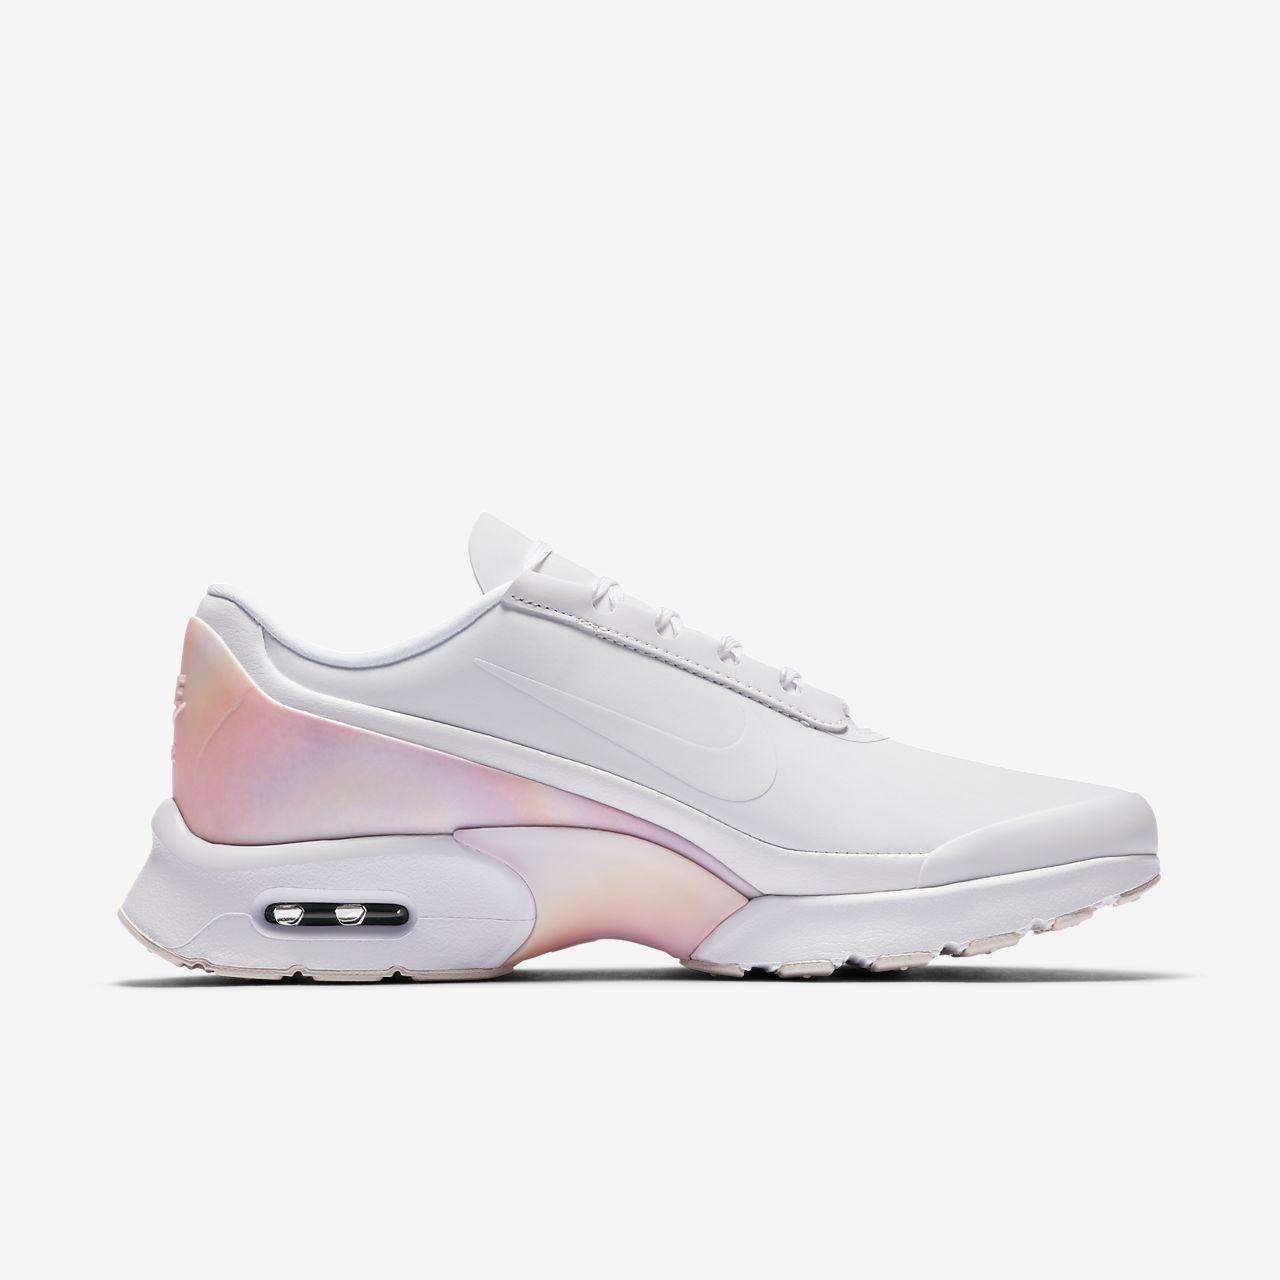 Chaussures De Sport En Cuir Air Max De Nike Jewell bOiebgnwyN